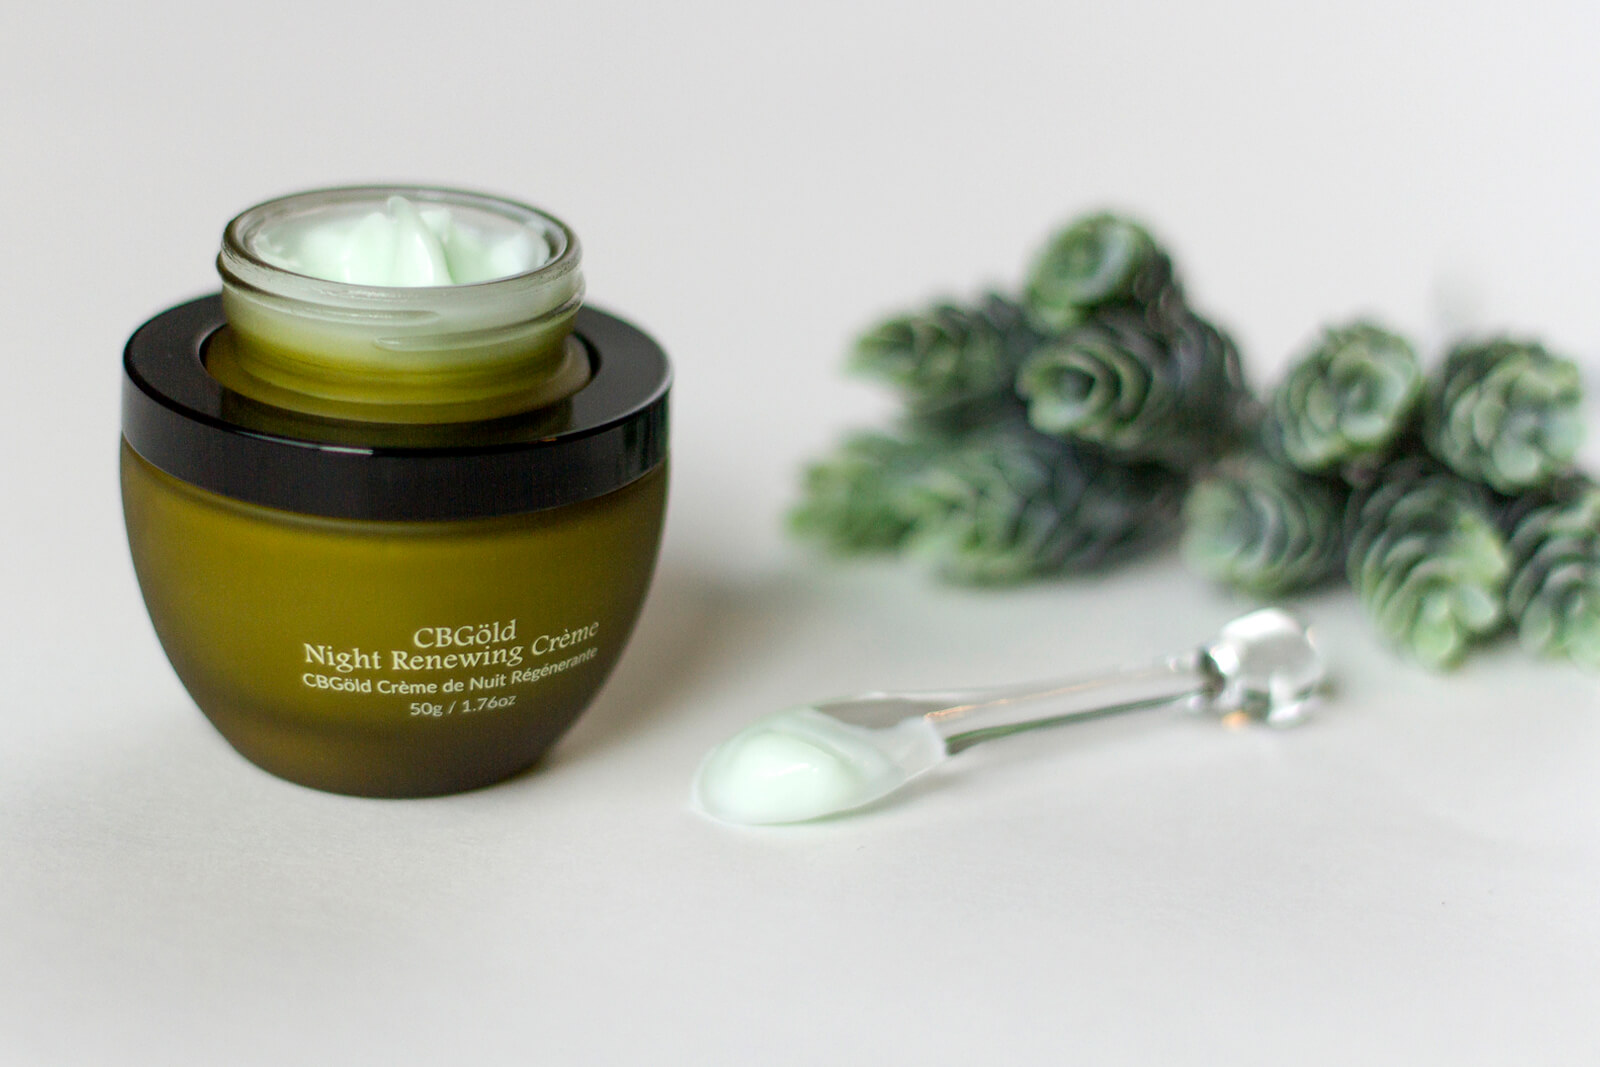 CbGaRDN cream in jar and on applicator